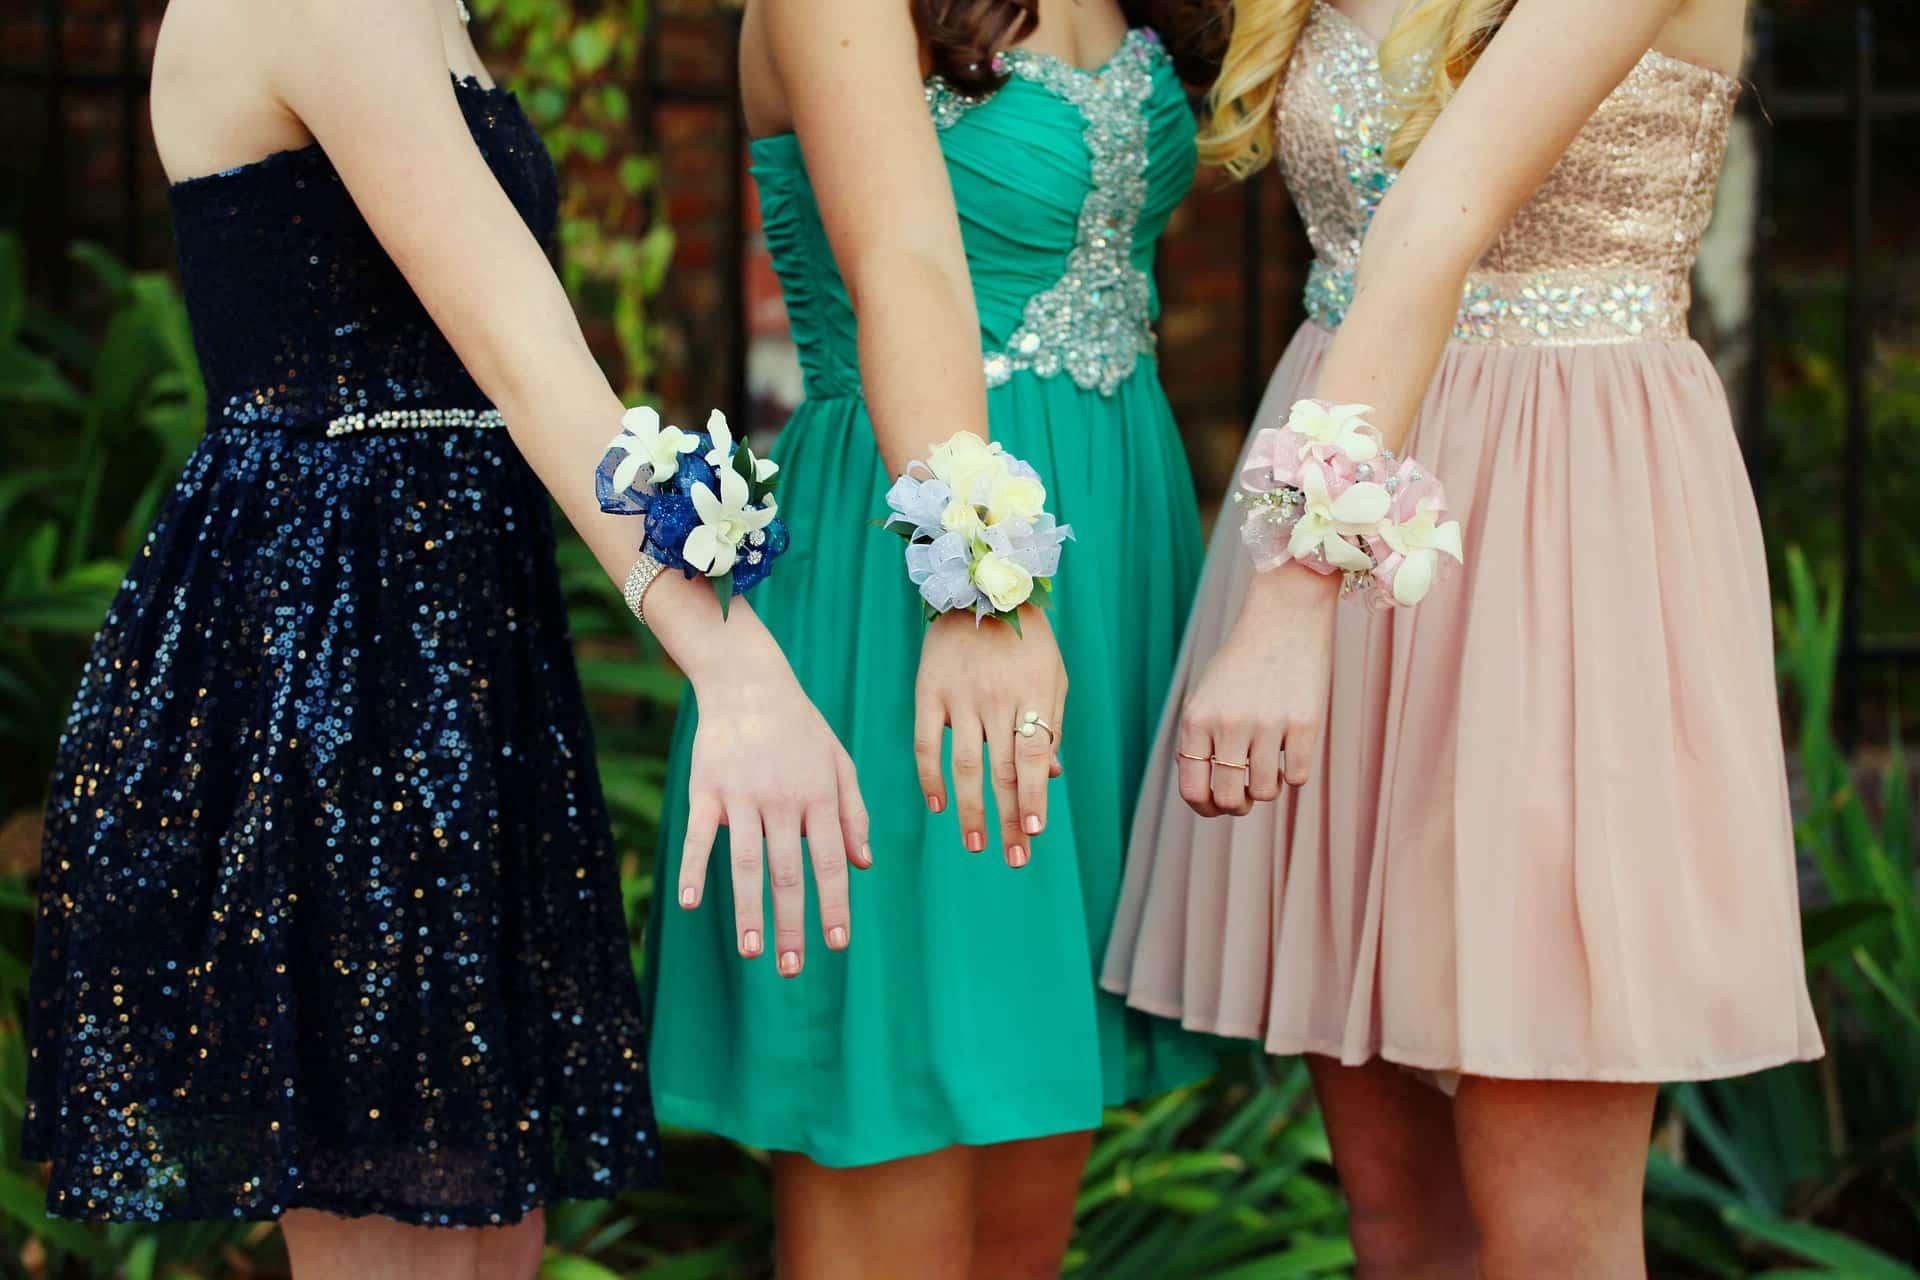 15 School Dance Themes (That Aren't